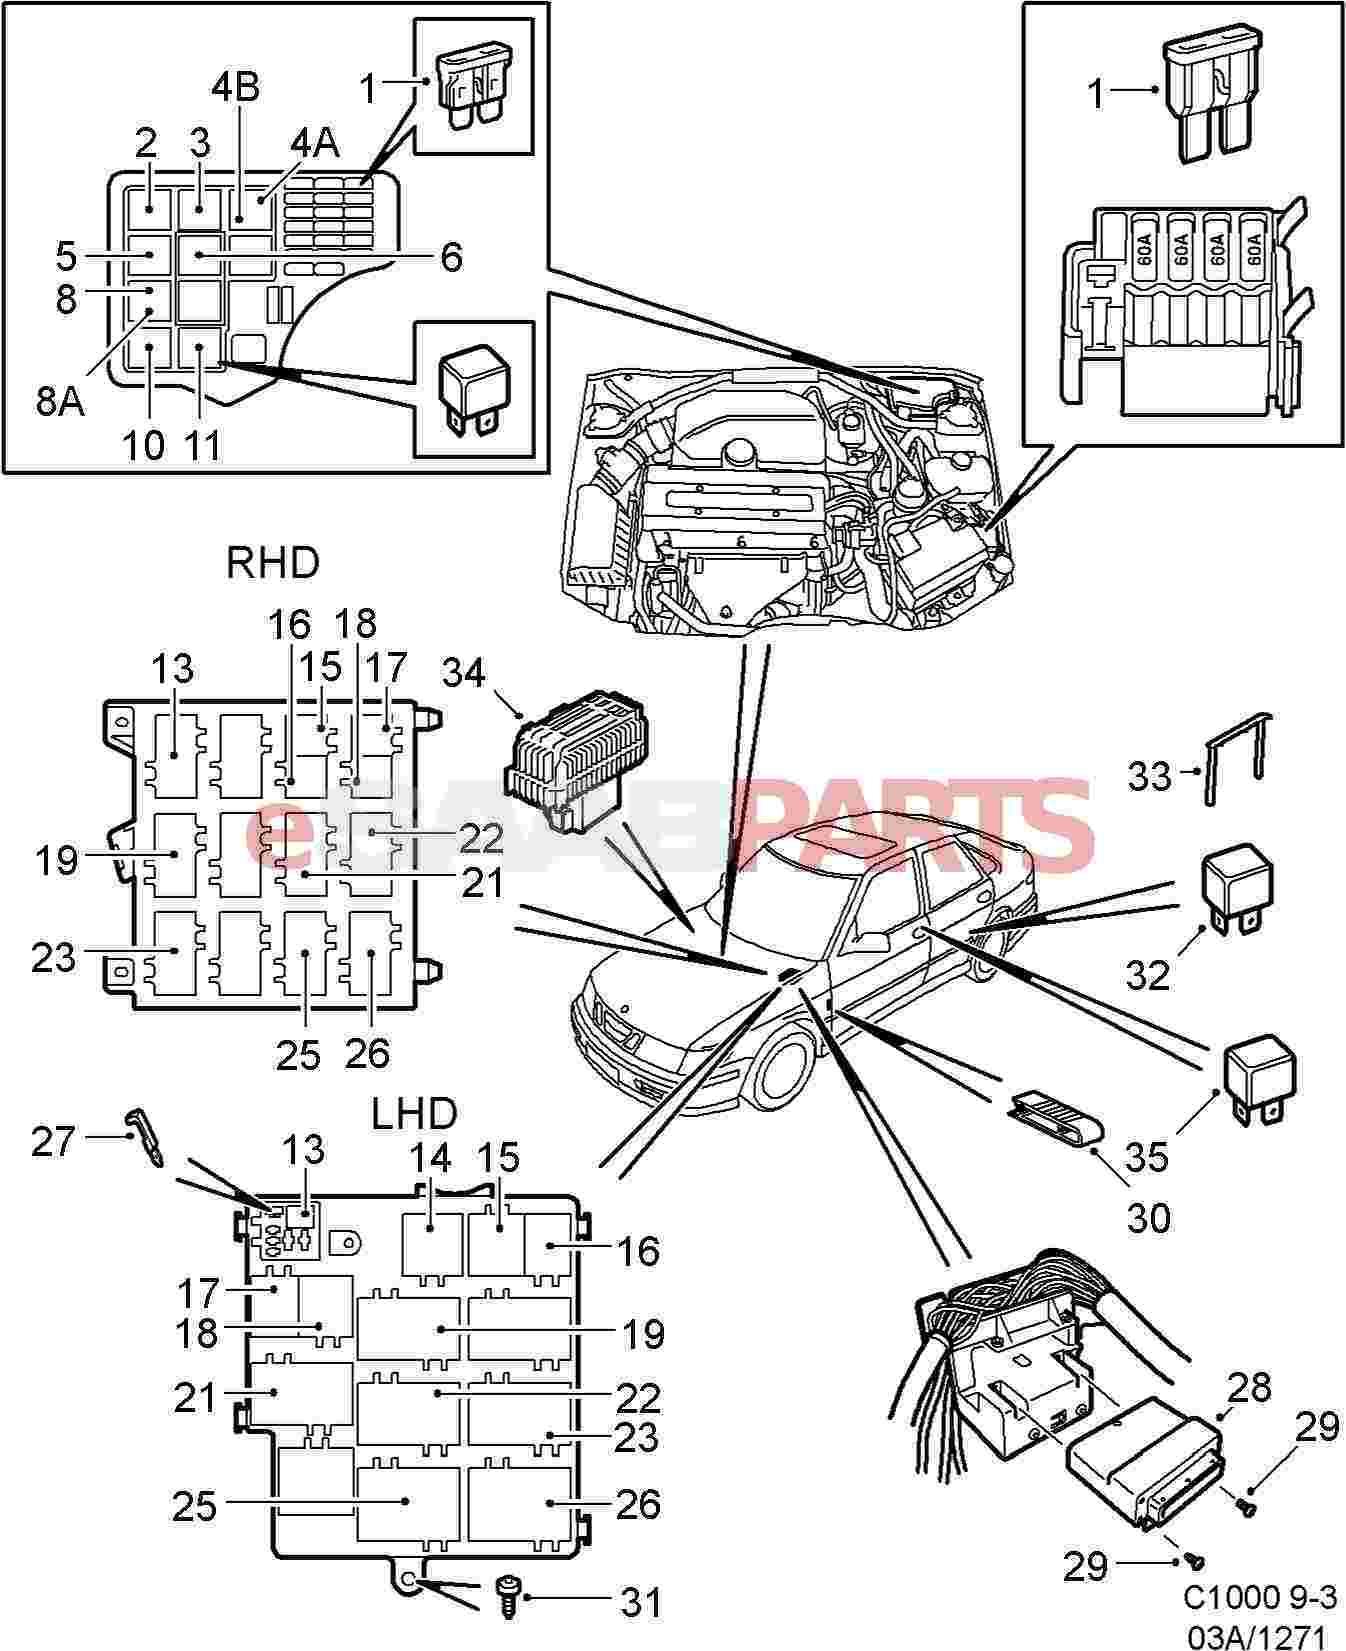 saab 9 3 stereo wiring diagram also saab 9 3 fuse box diagram on saab